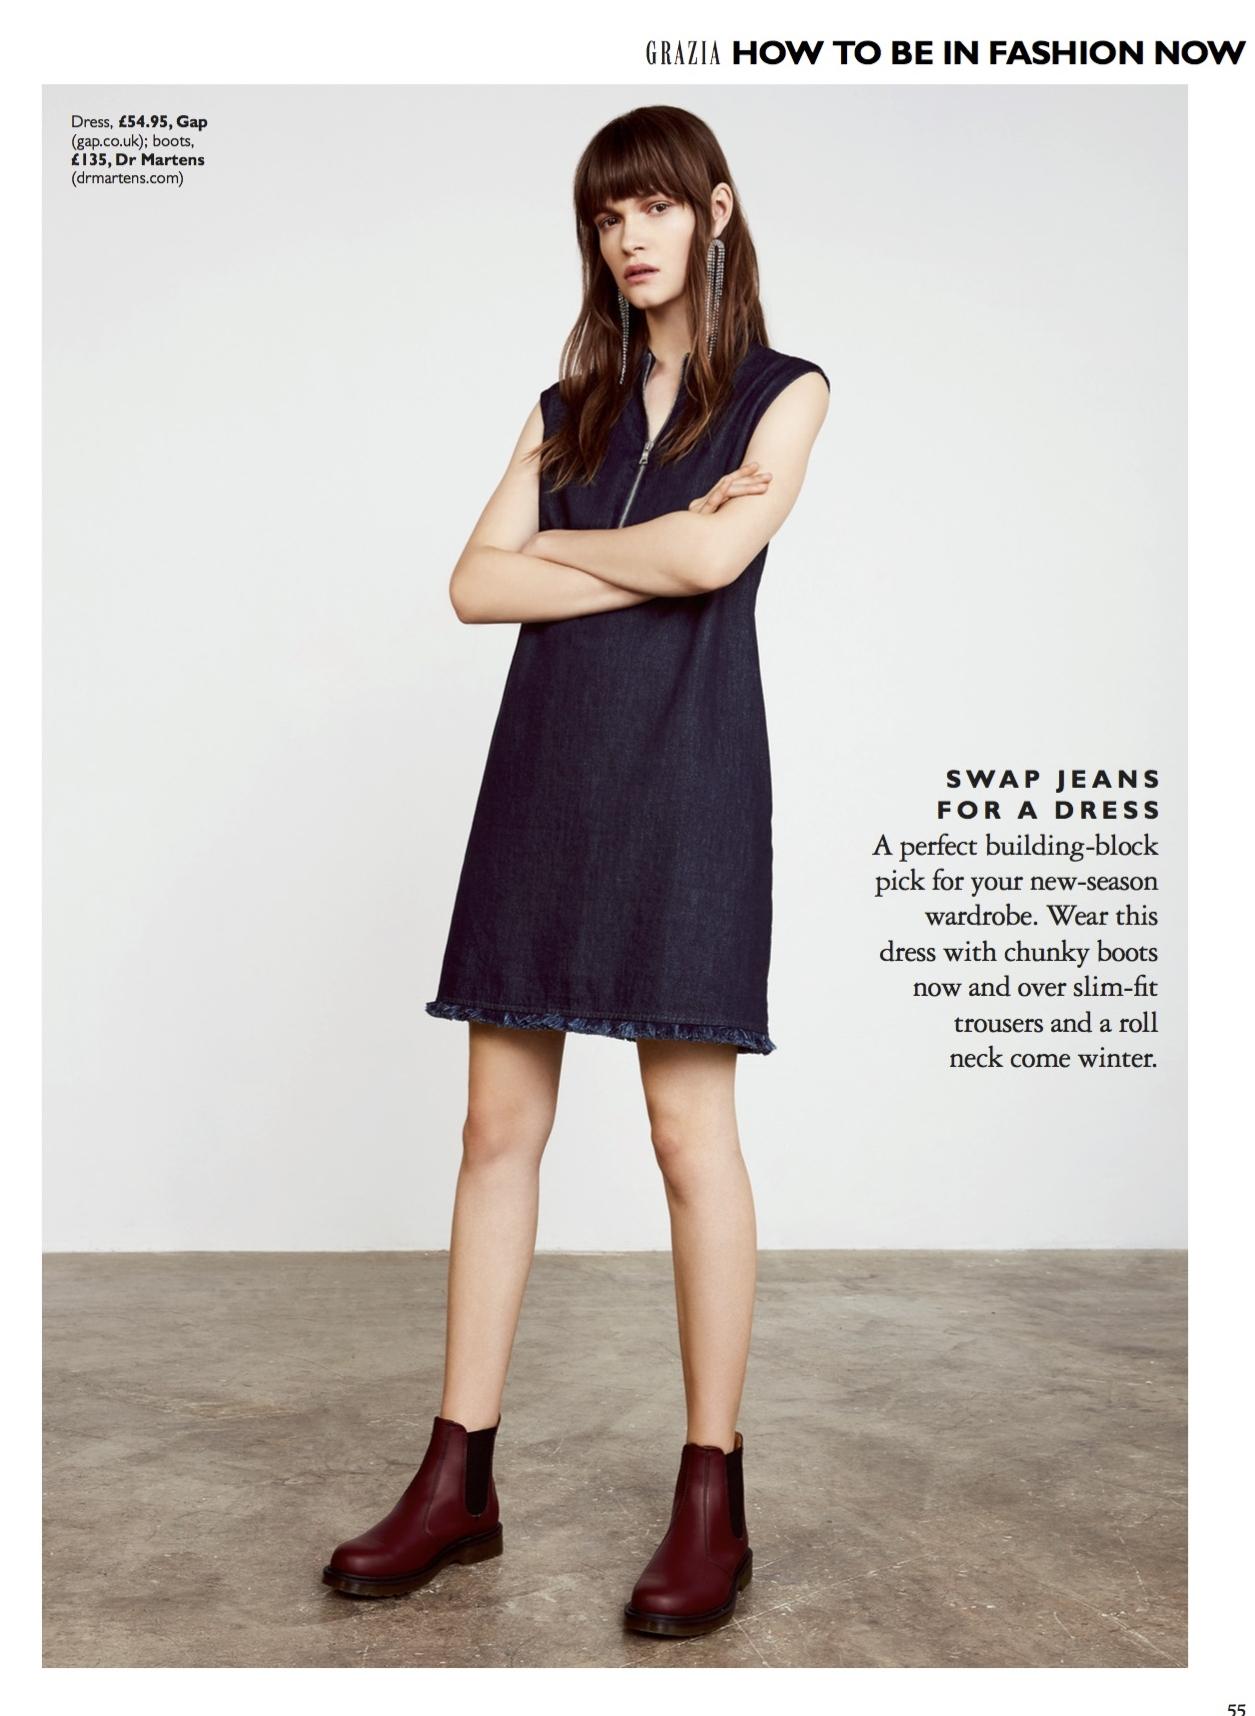 Fashion_ClosetConstruction Denim 6pp_pdf_4 copy.jpg